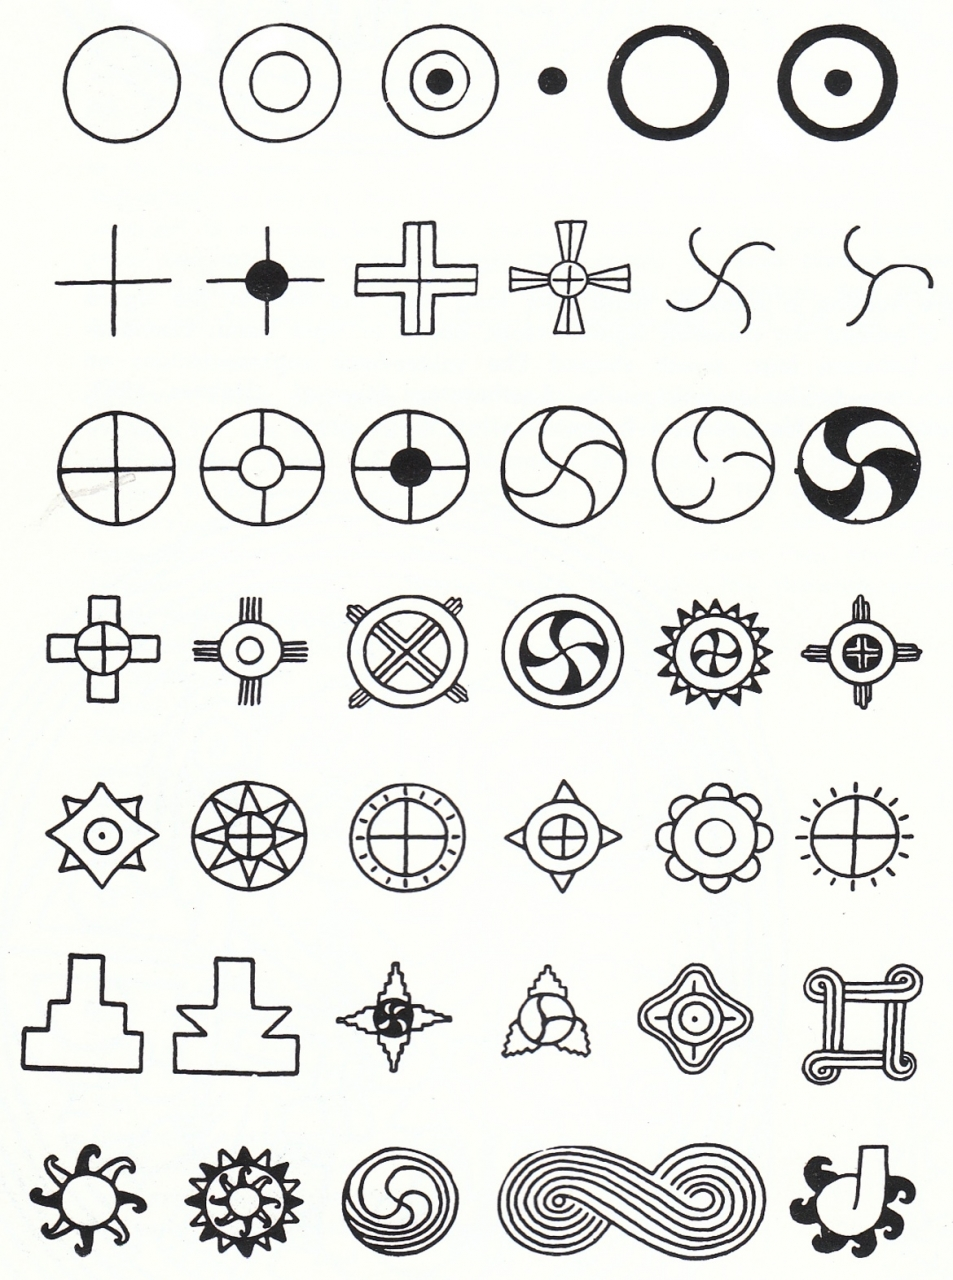 7 Symbols.jpg